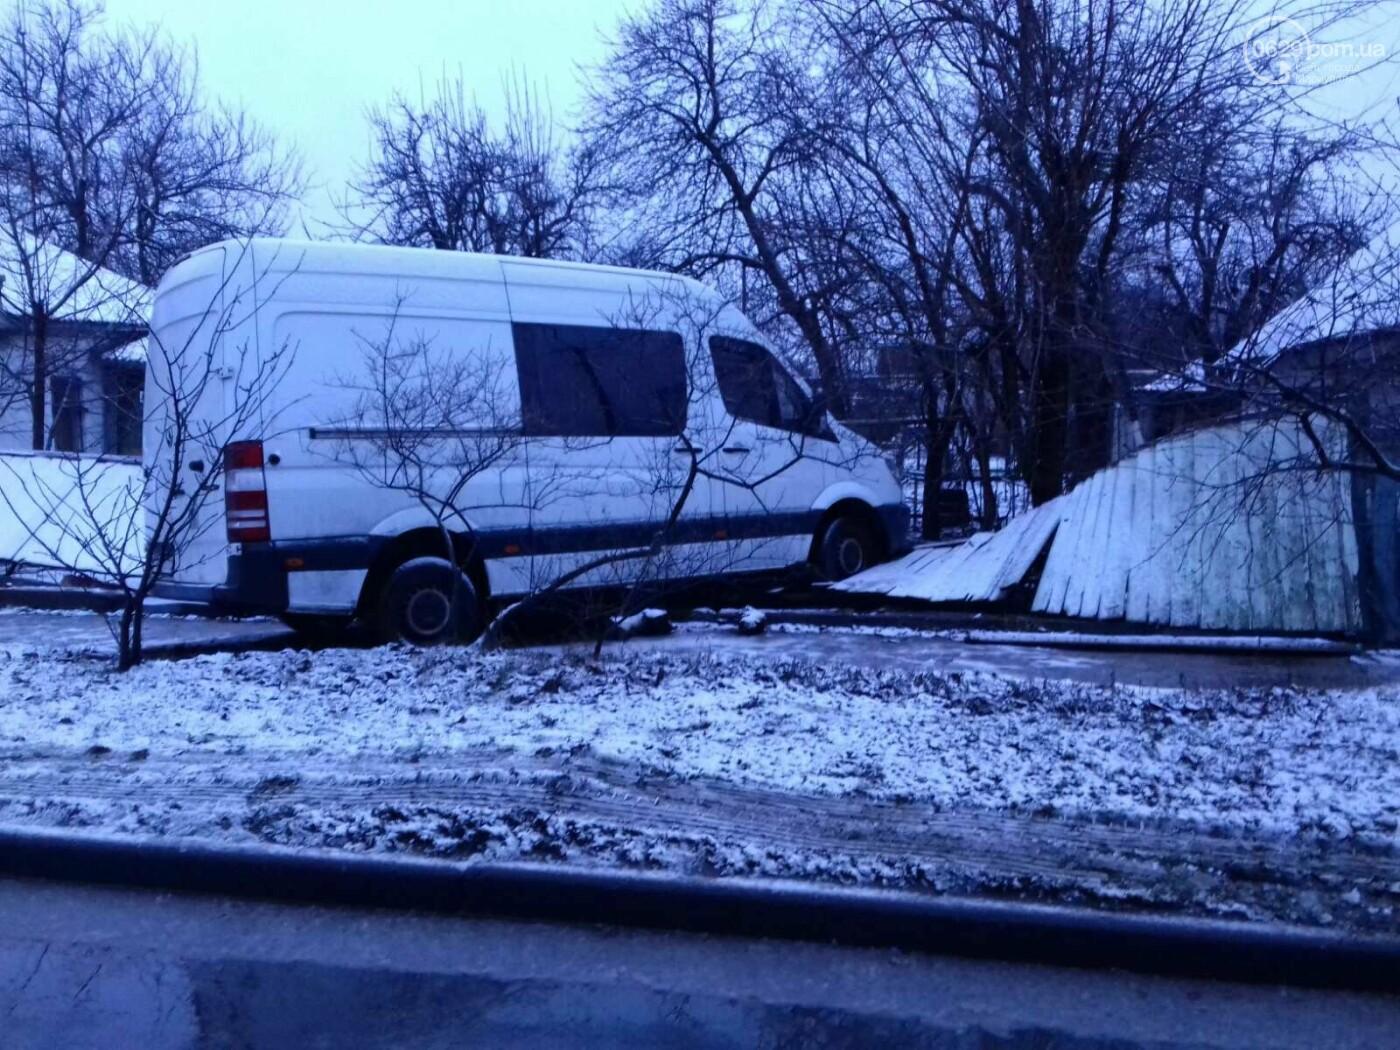 На Левобережье Мариуполя микроавтобус врезался в забор жилого дома, - ФОТО, фото-5